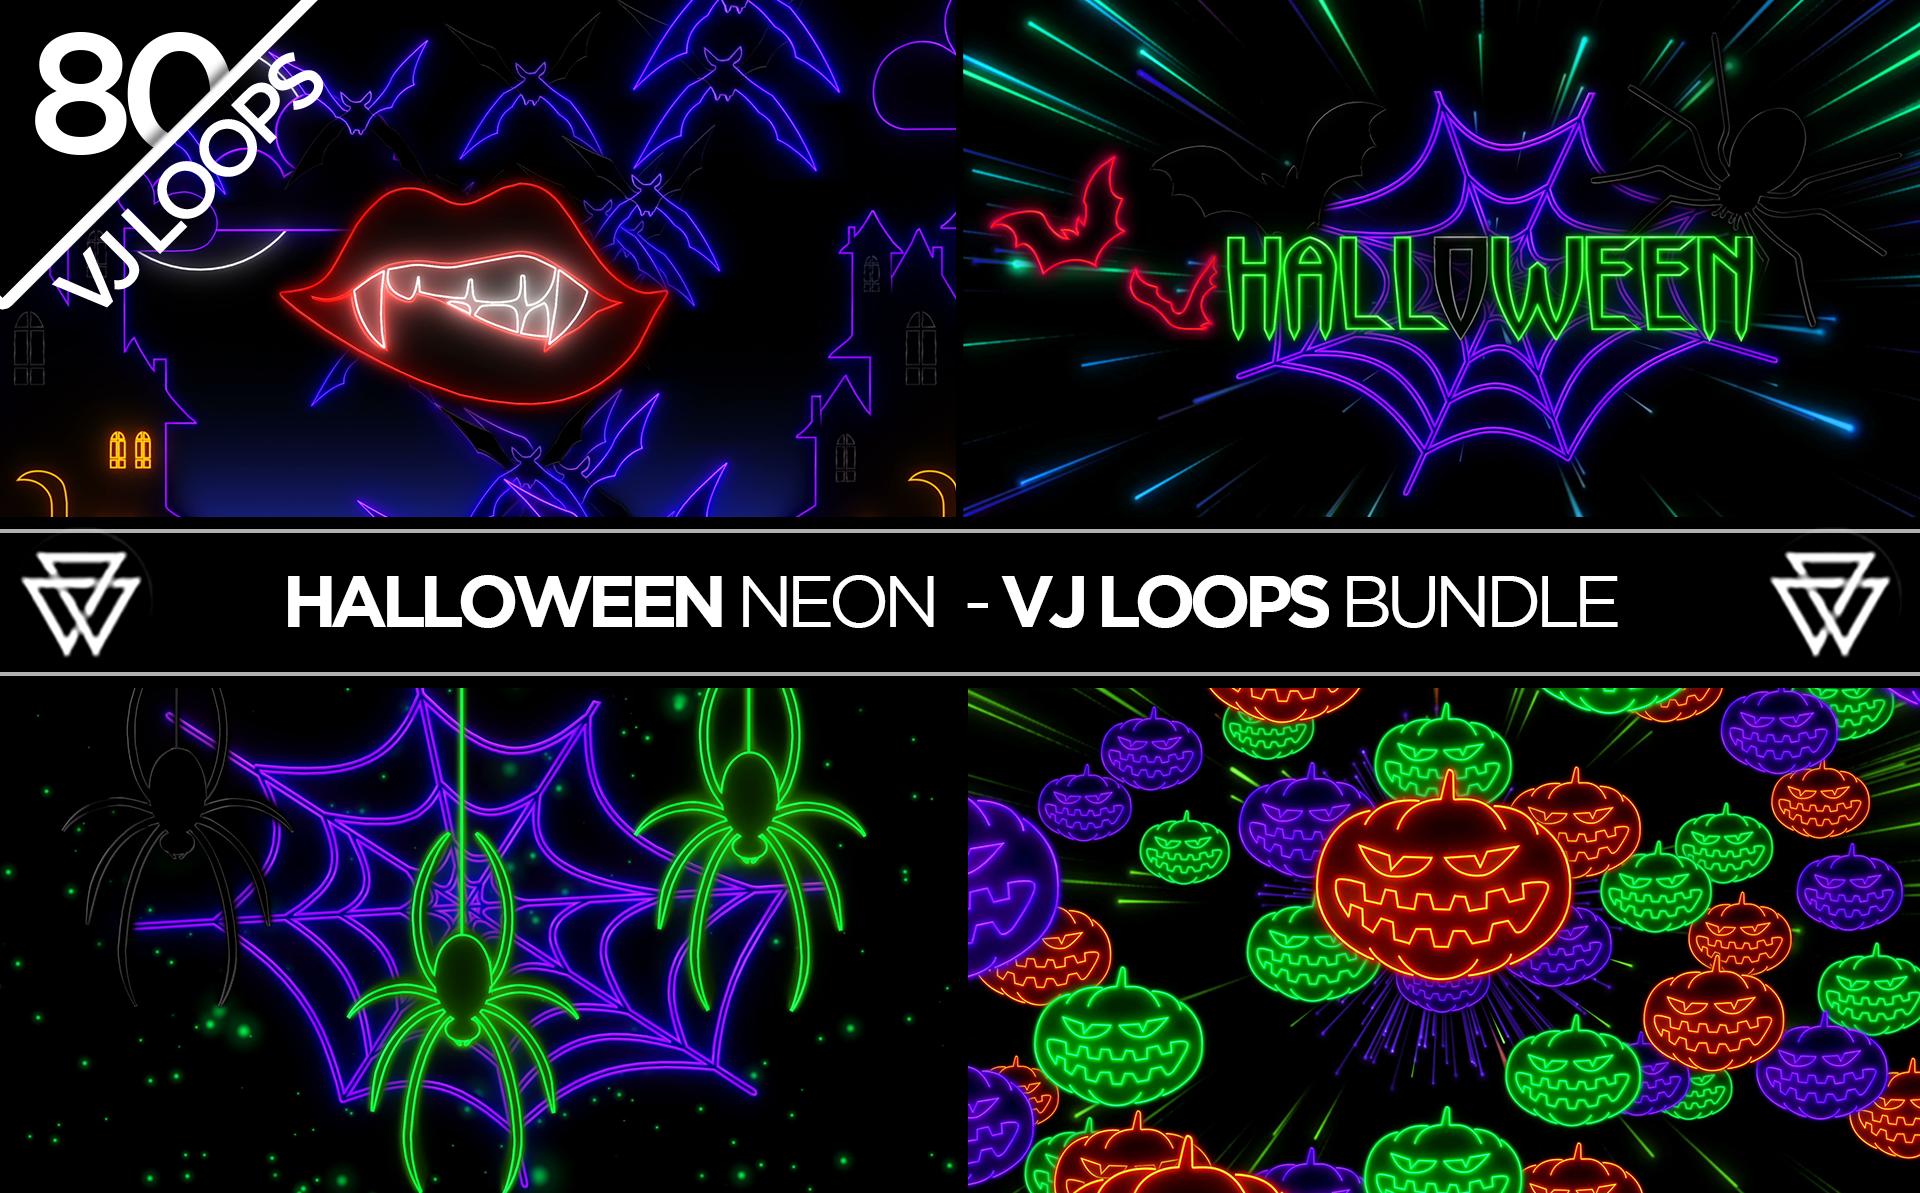 halloween neon  80 vj loops